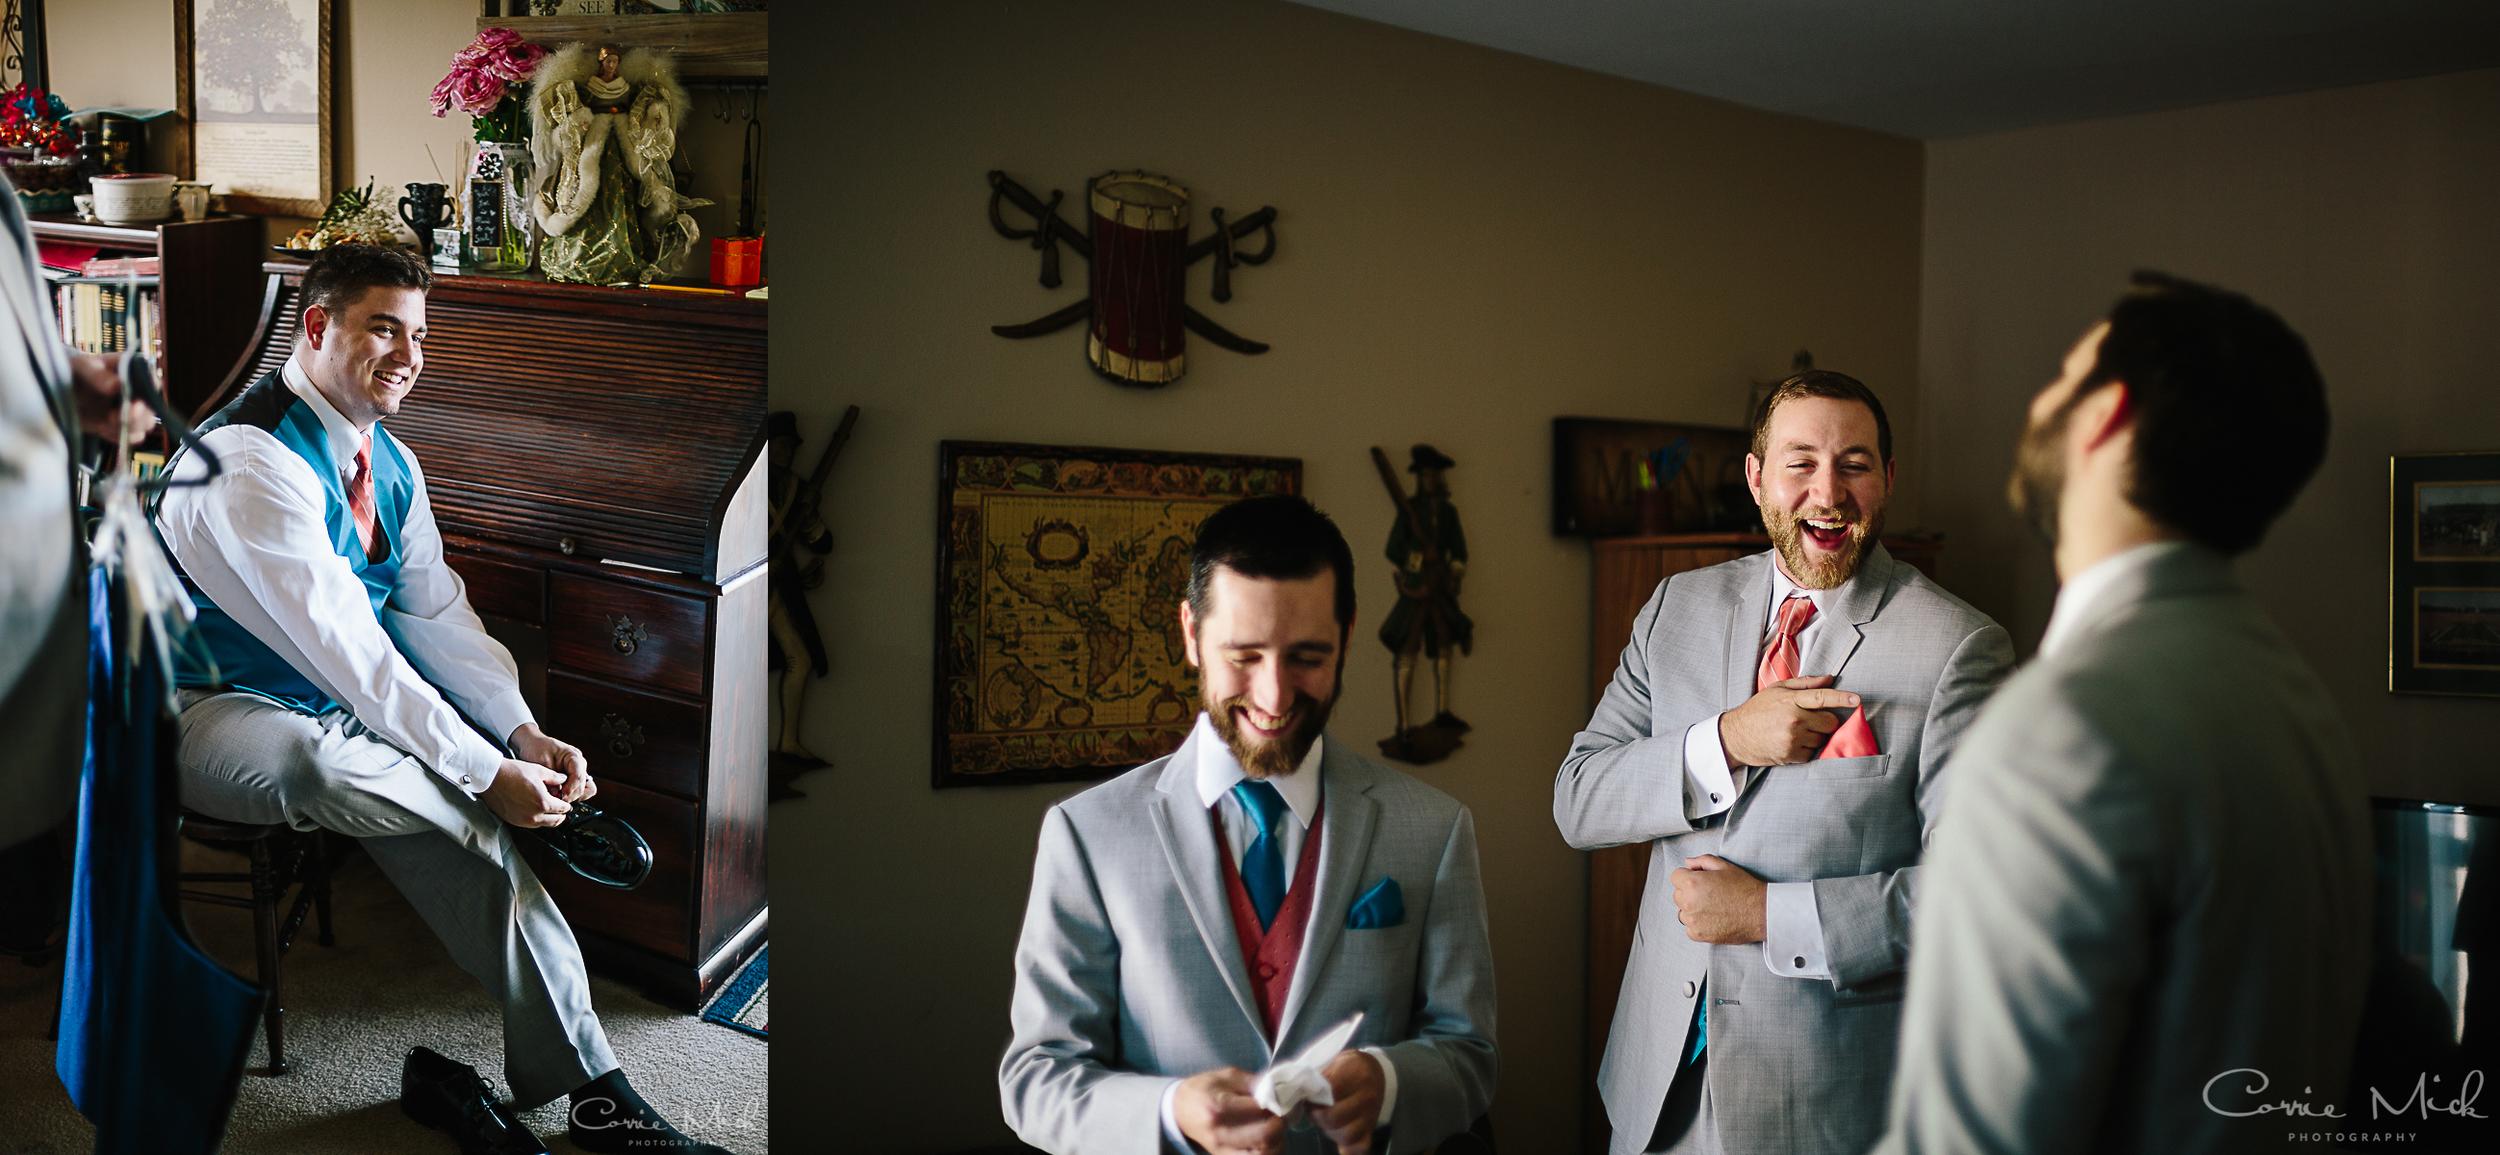 Groomsmen Getting Ready - Corrie Mick Photography.jpg